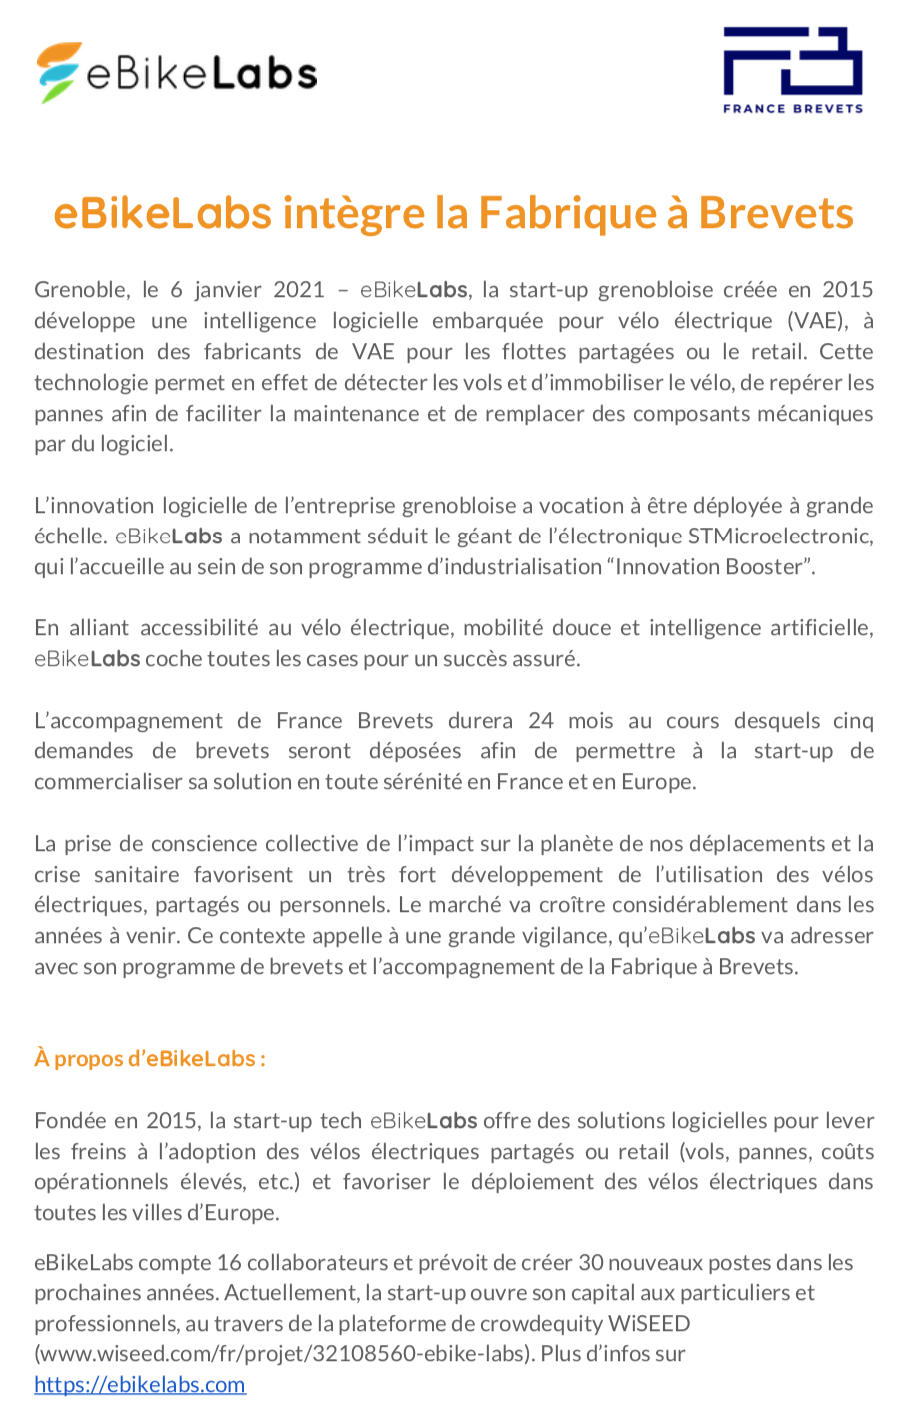 PR-France Brevets Partnership-preview